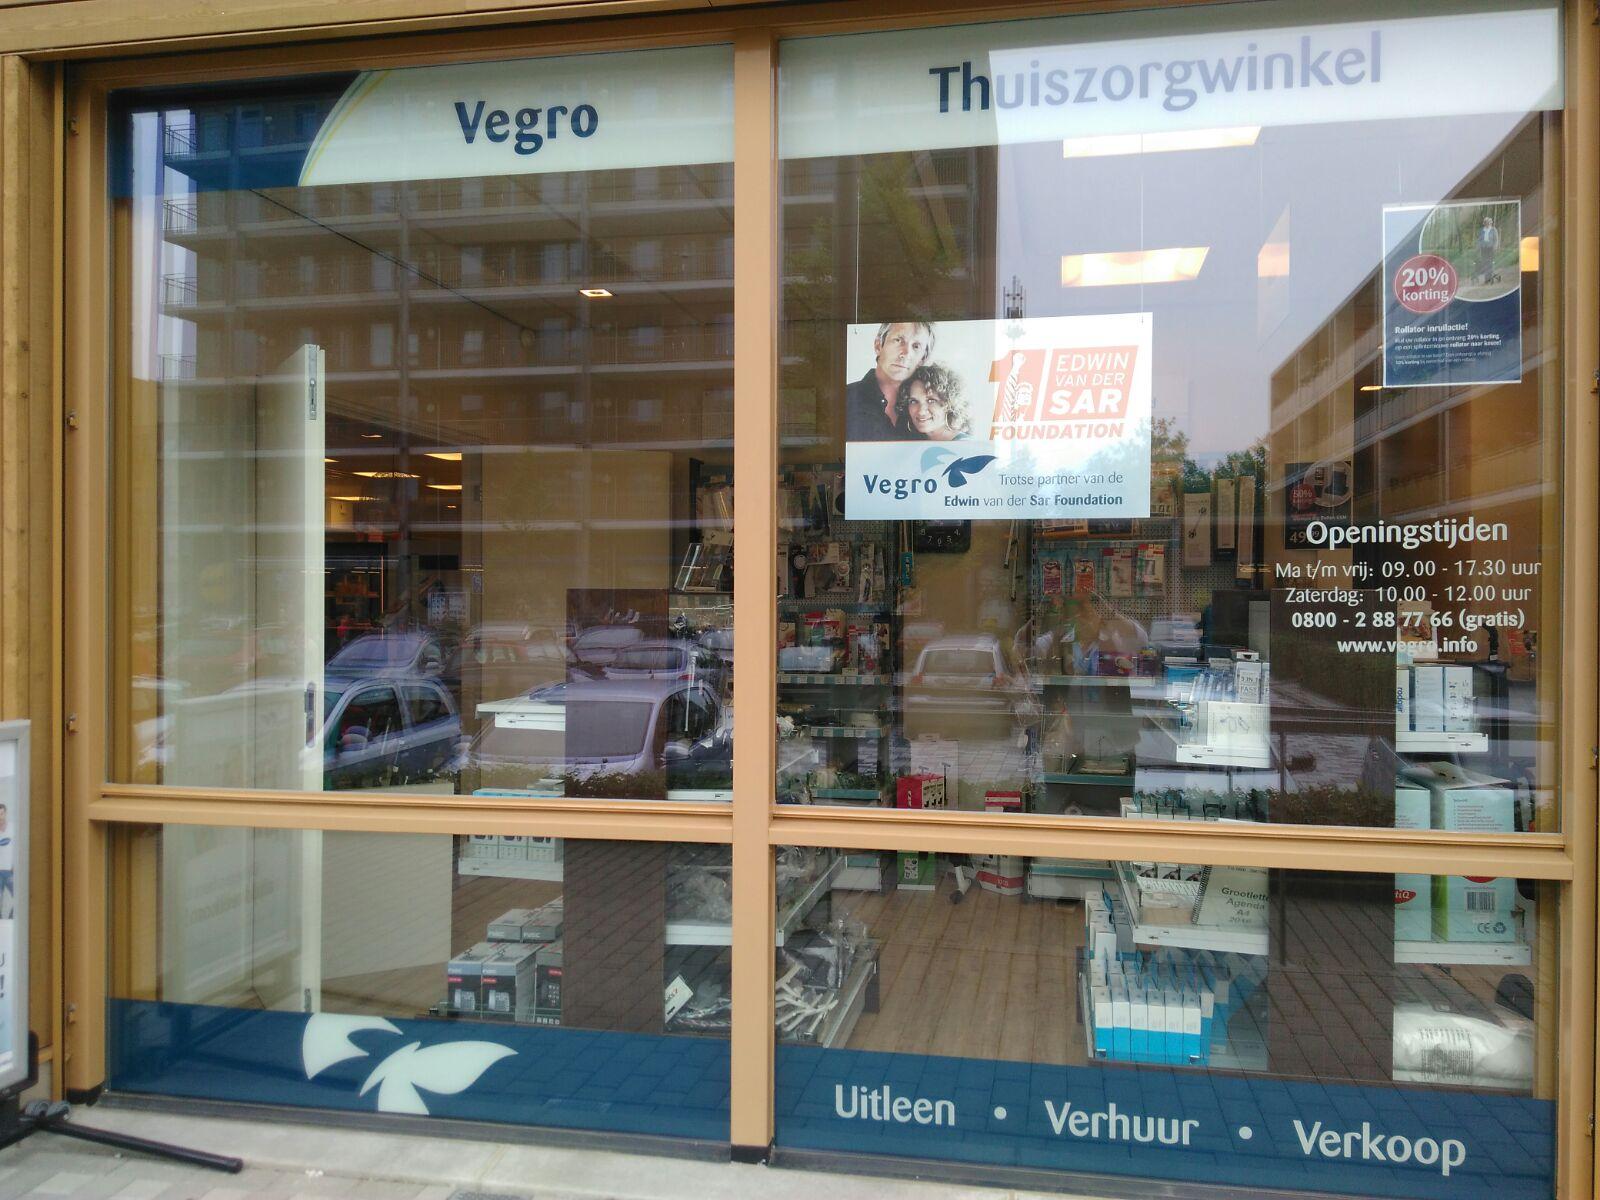 Wc Stoel Thuiszorgwinkel : Vegro thuiszorgwinkel nijmegen vegro expertisecentrum hulpmiddelen